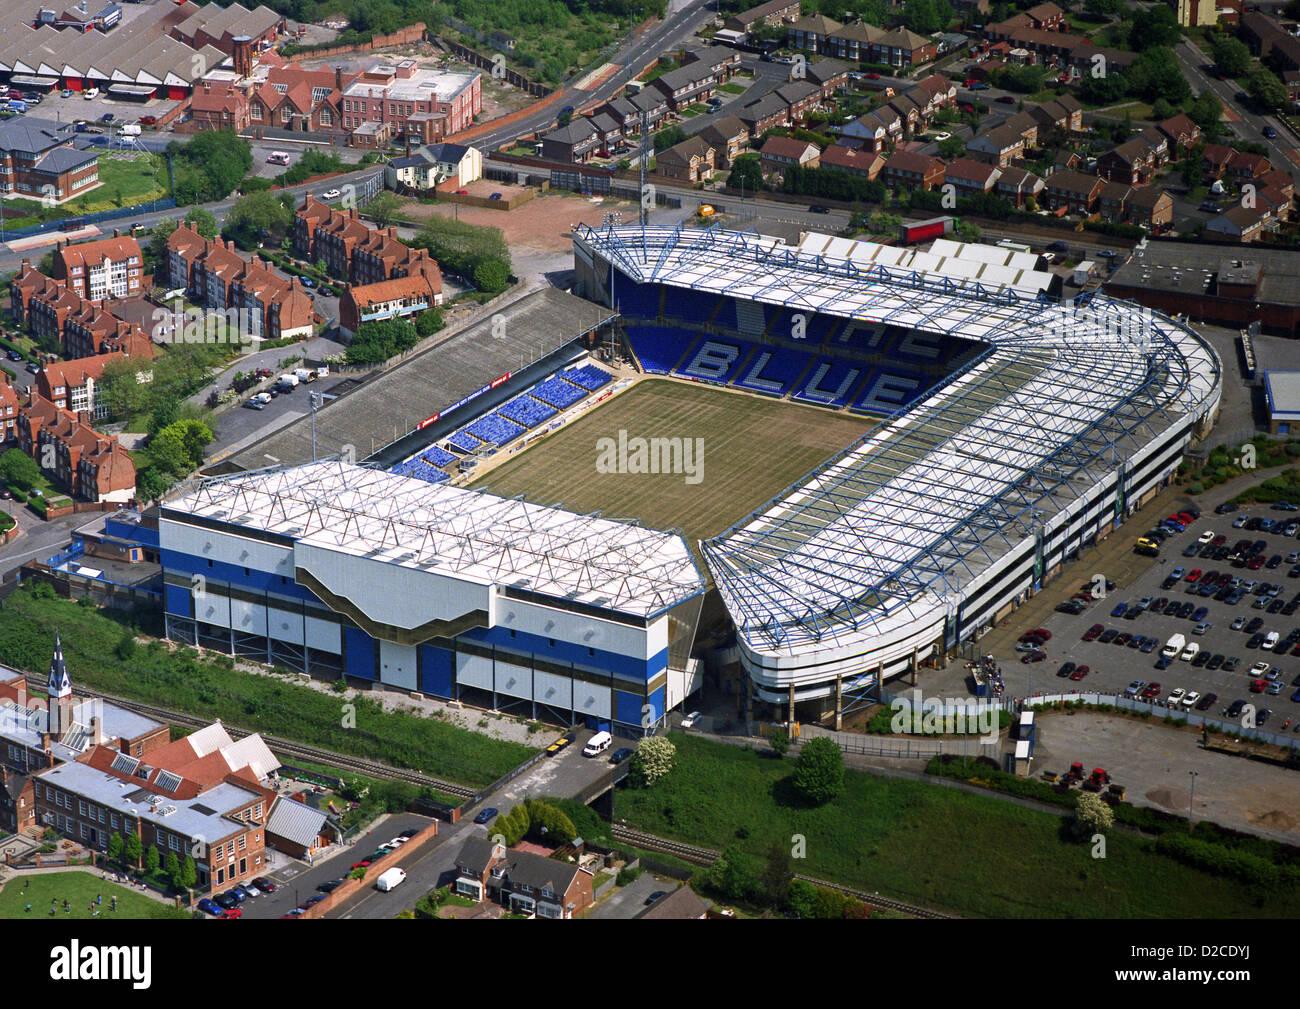 St Andrews Birmingham City Fc